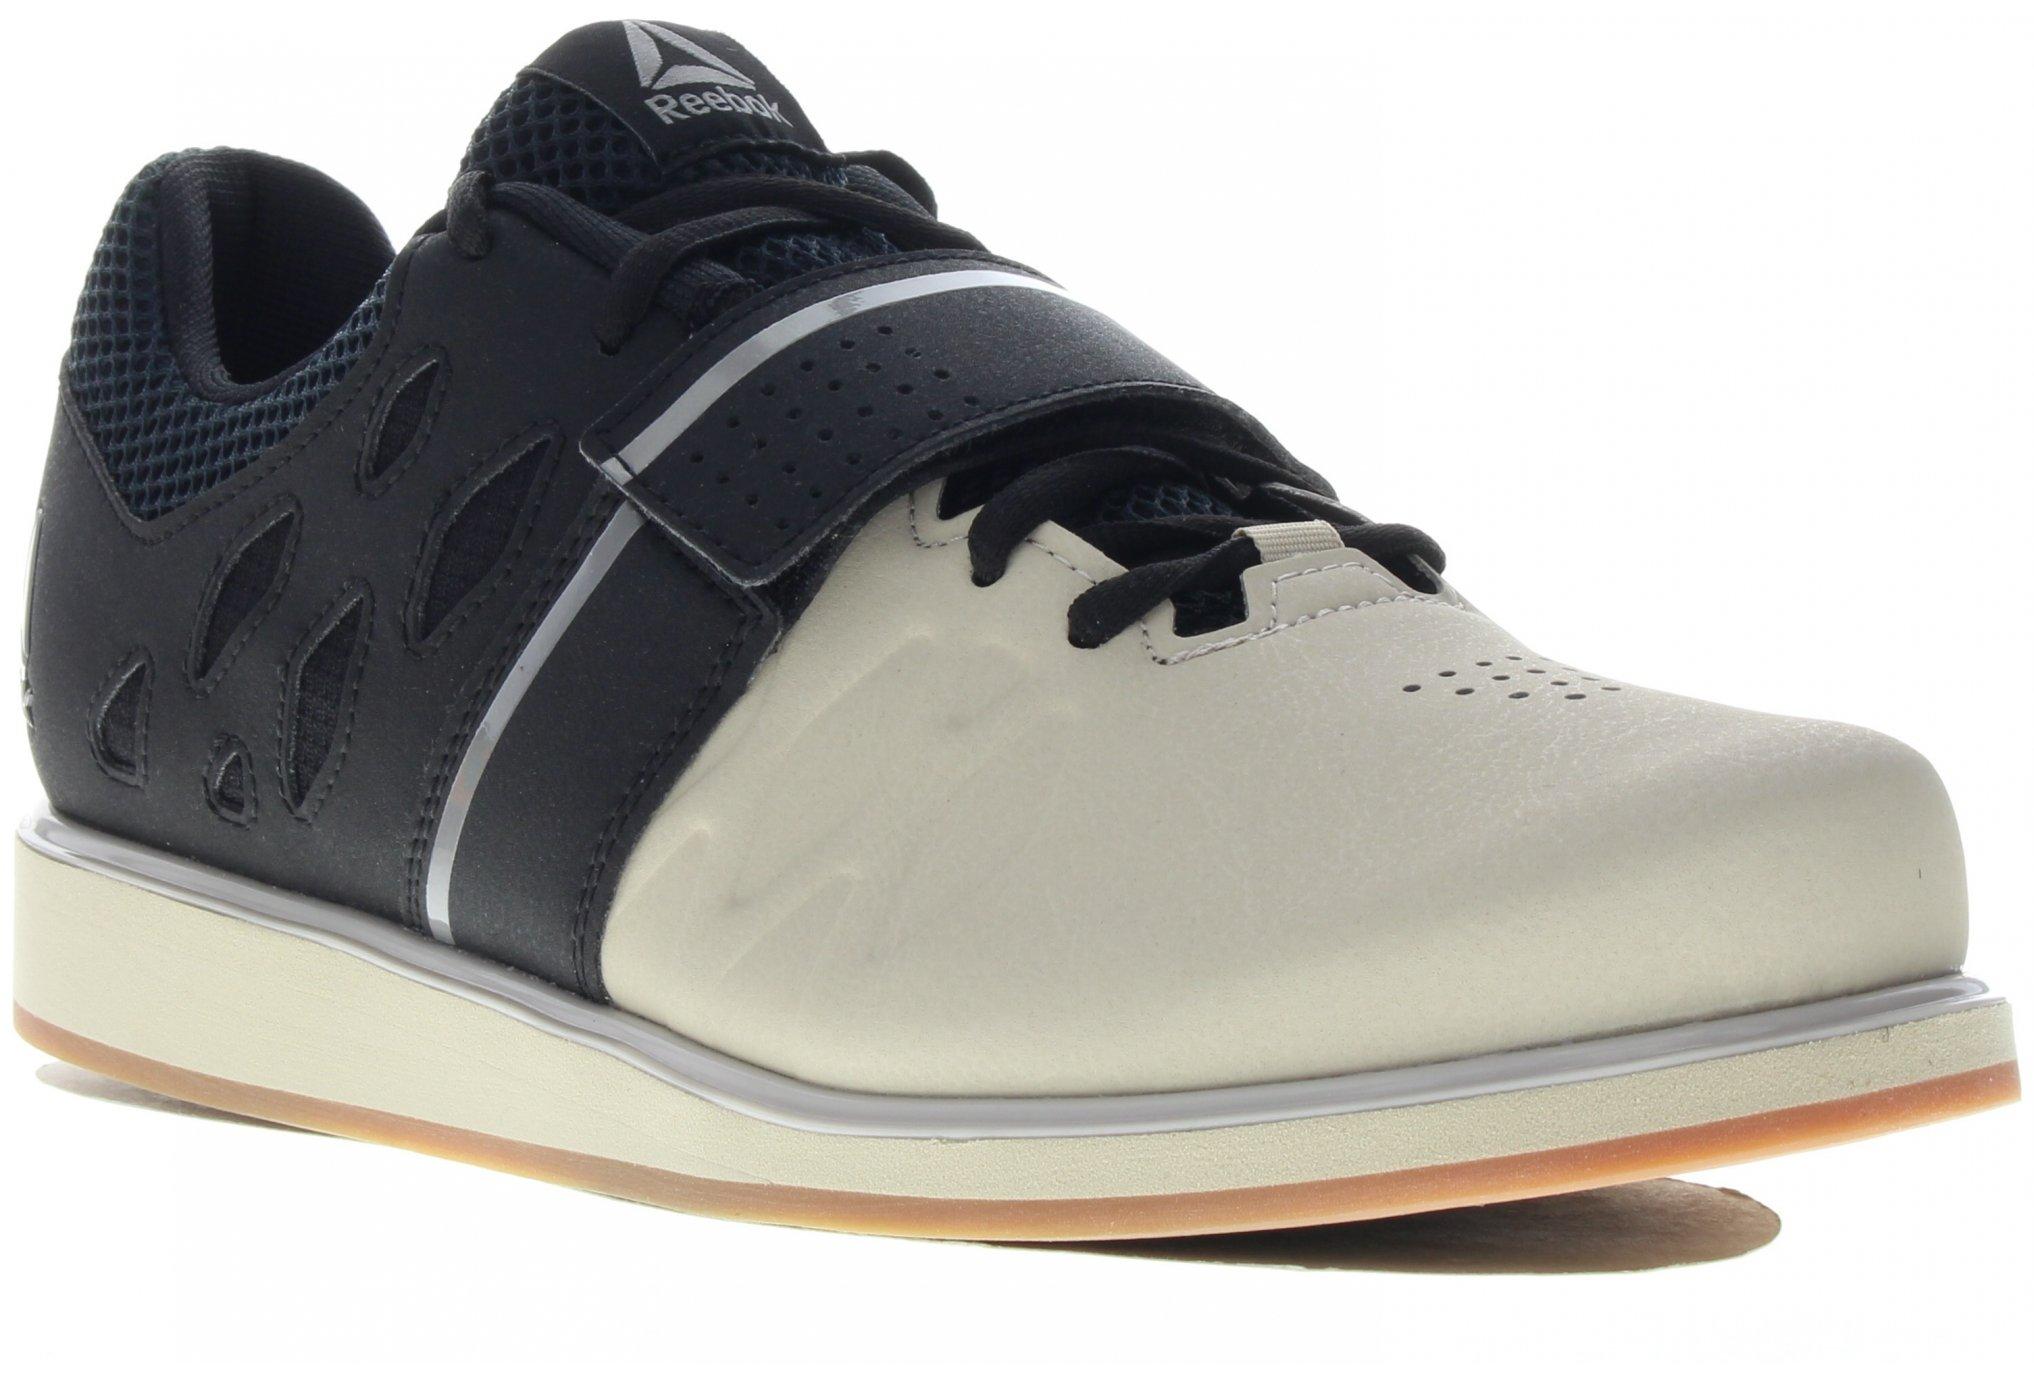 Reebok Lifter PR M Diététique Chaussures homme